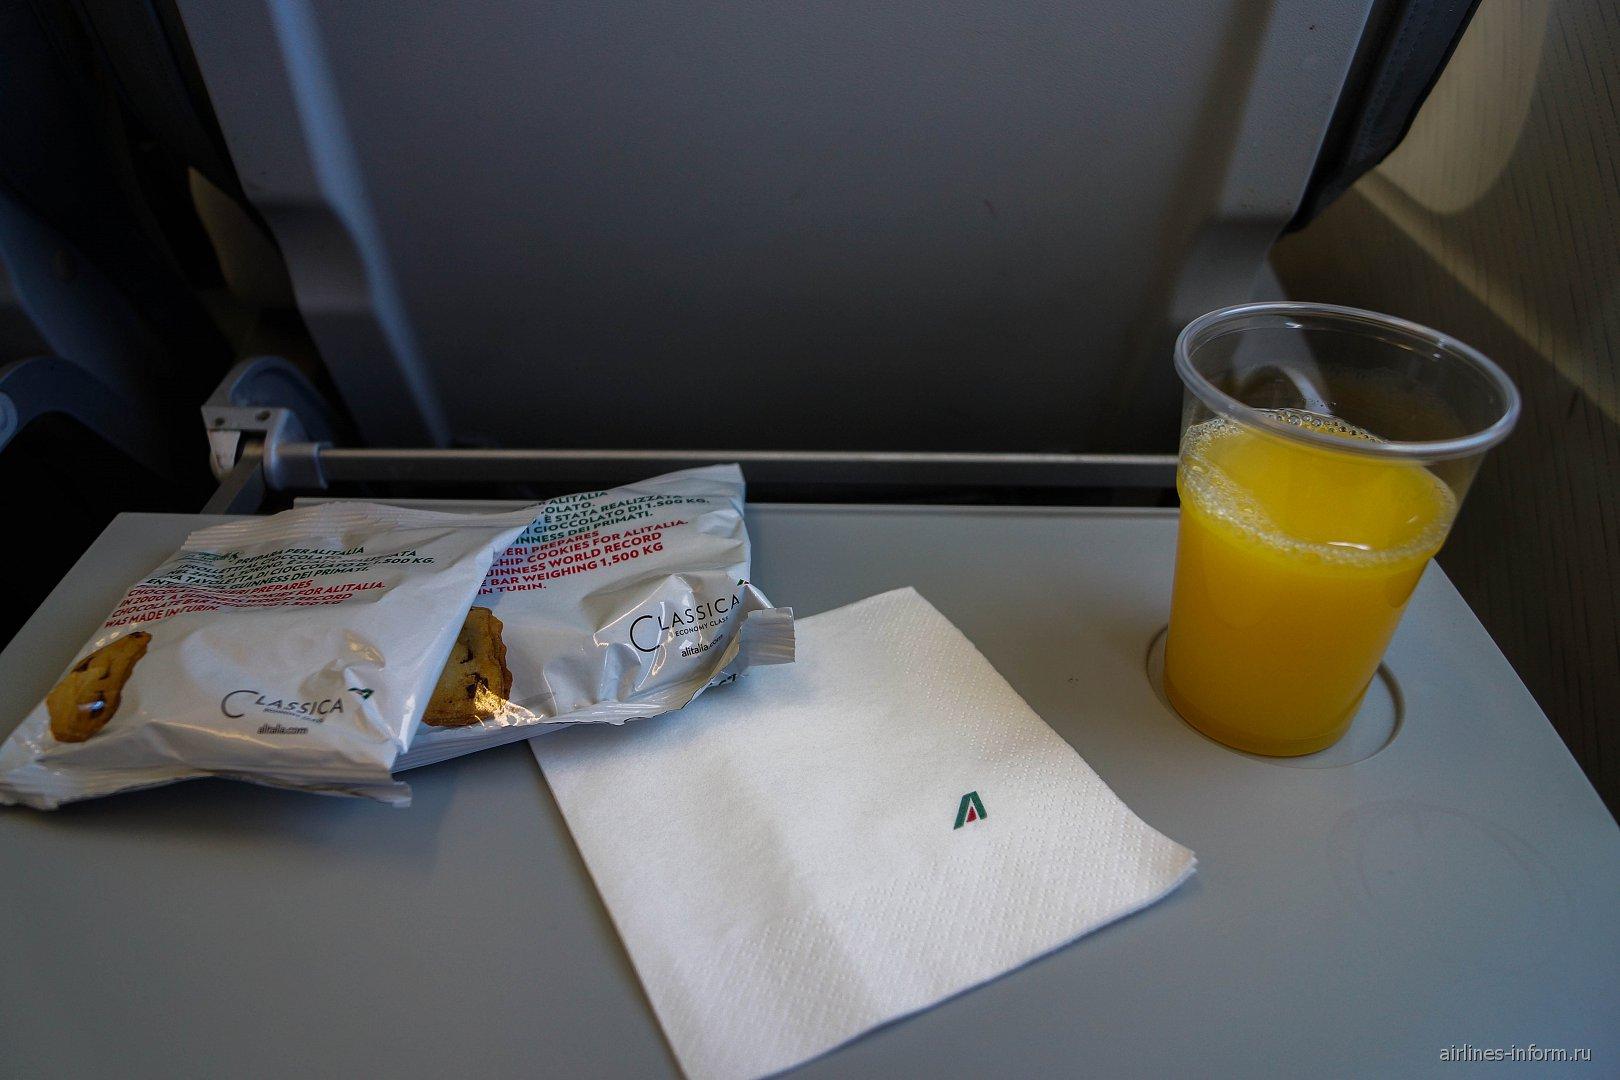 Печенье с соком на рейсе Бриндизи-Рим авиакомпании Alitalia